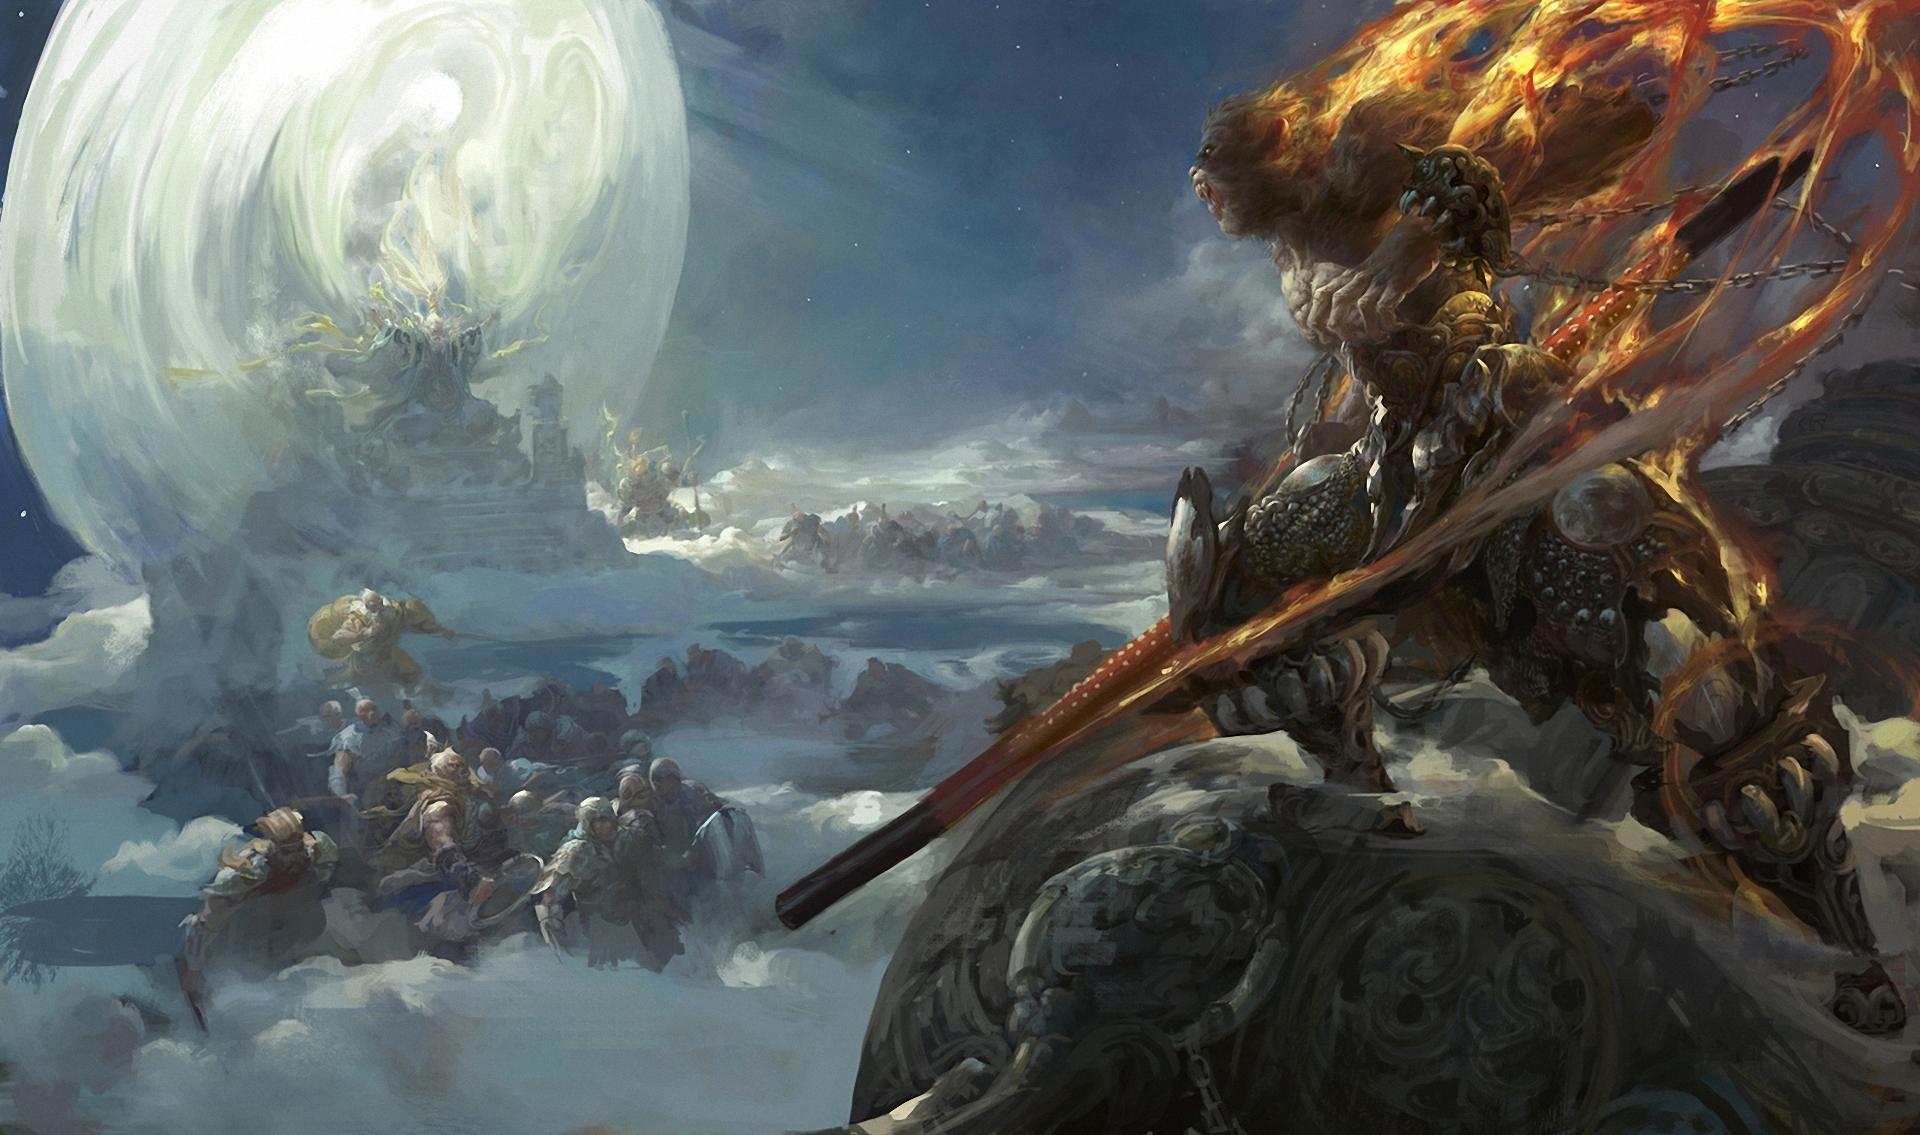 Fantasy Battle Scene Art - Fantasy Art Fenghua Zhong The Battle Begin